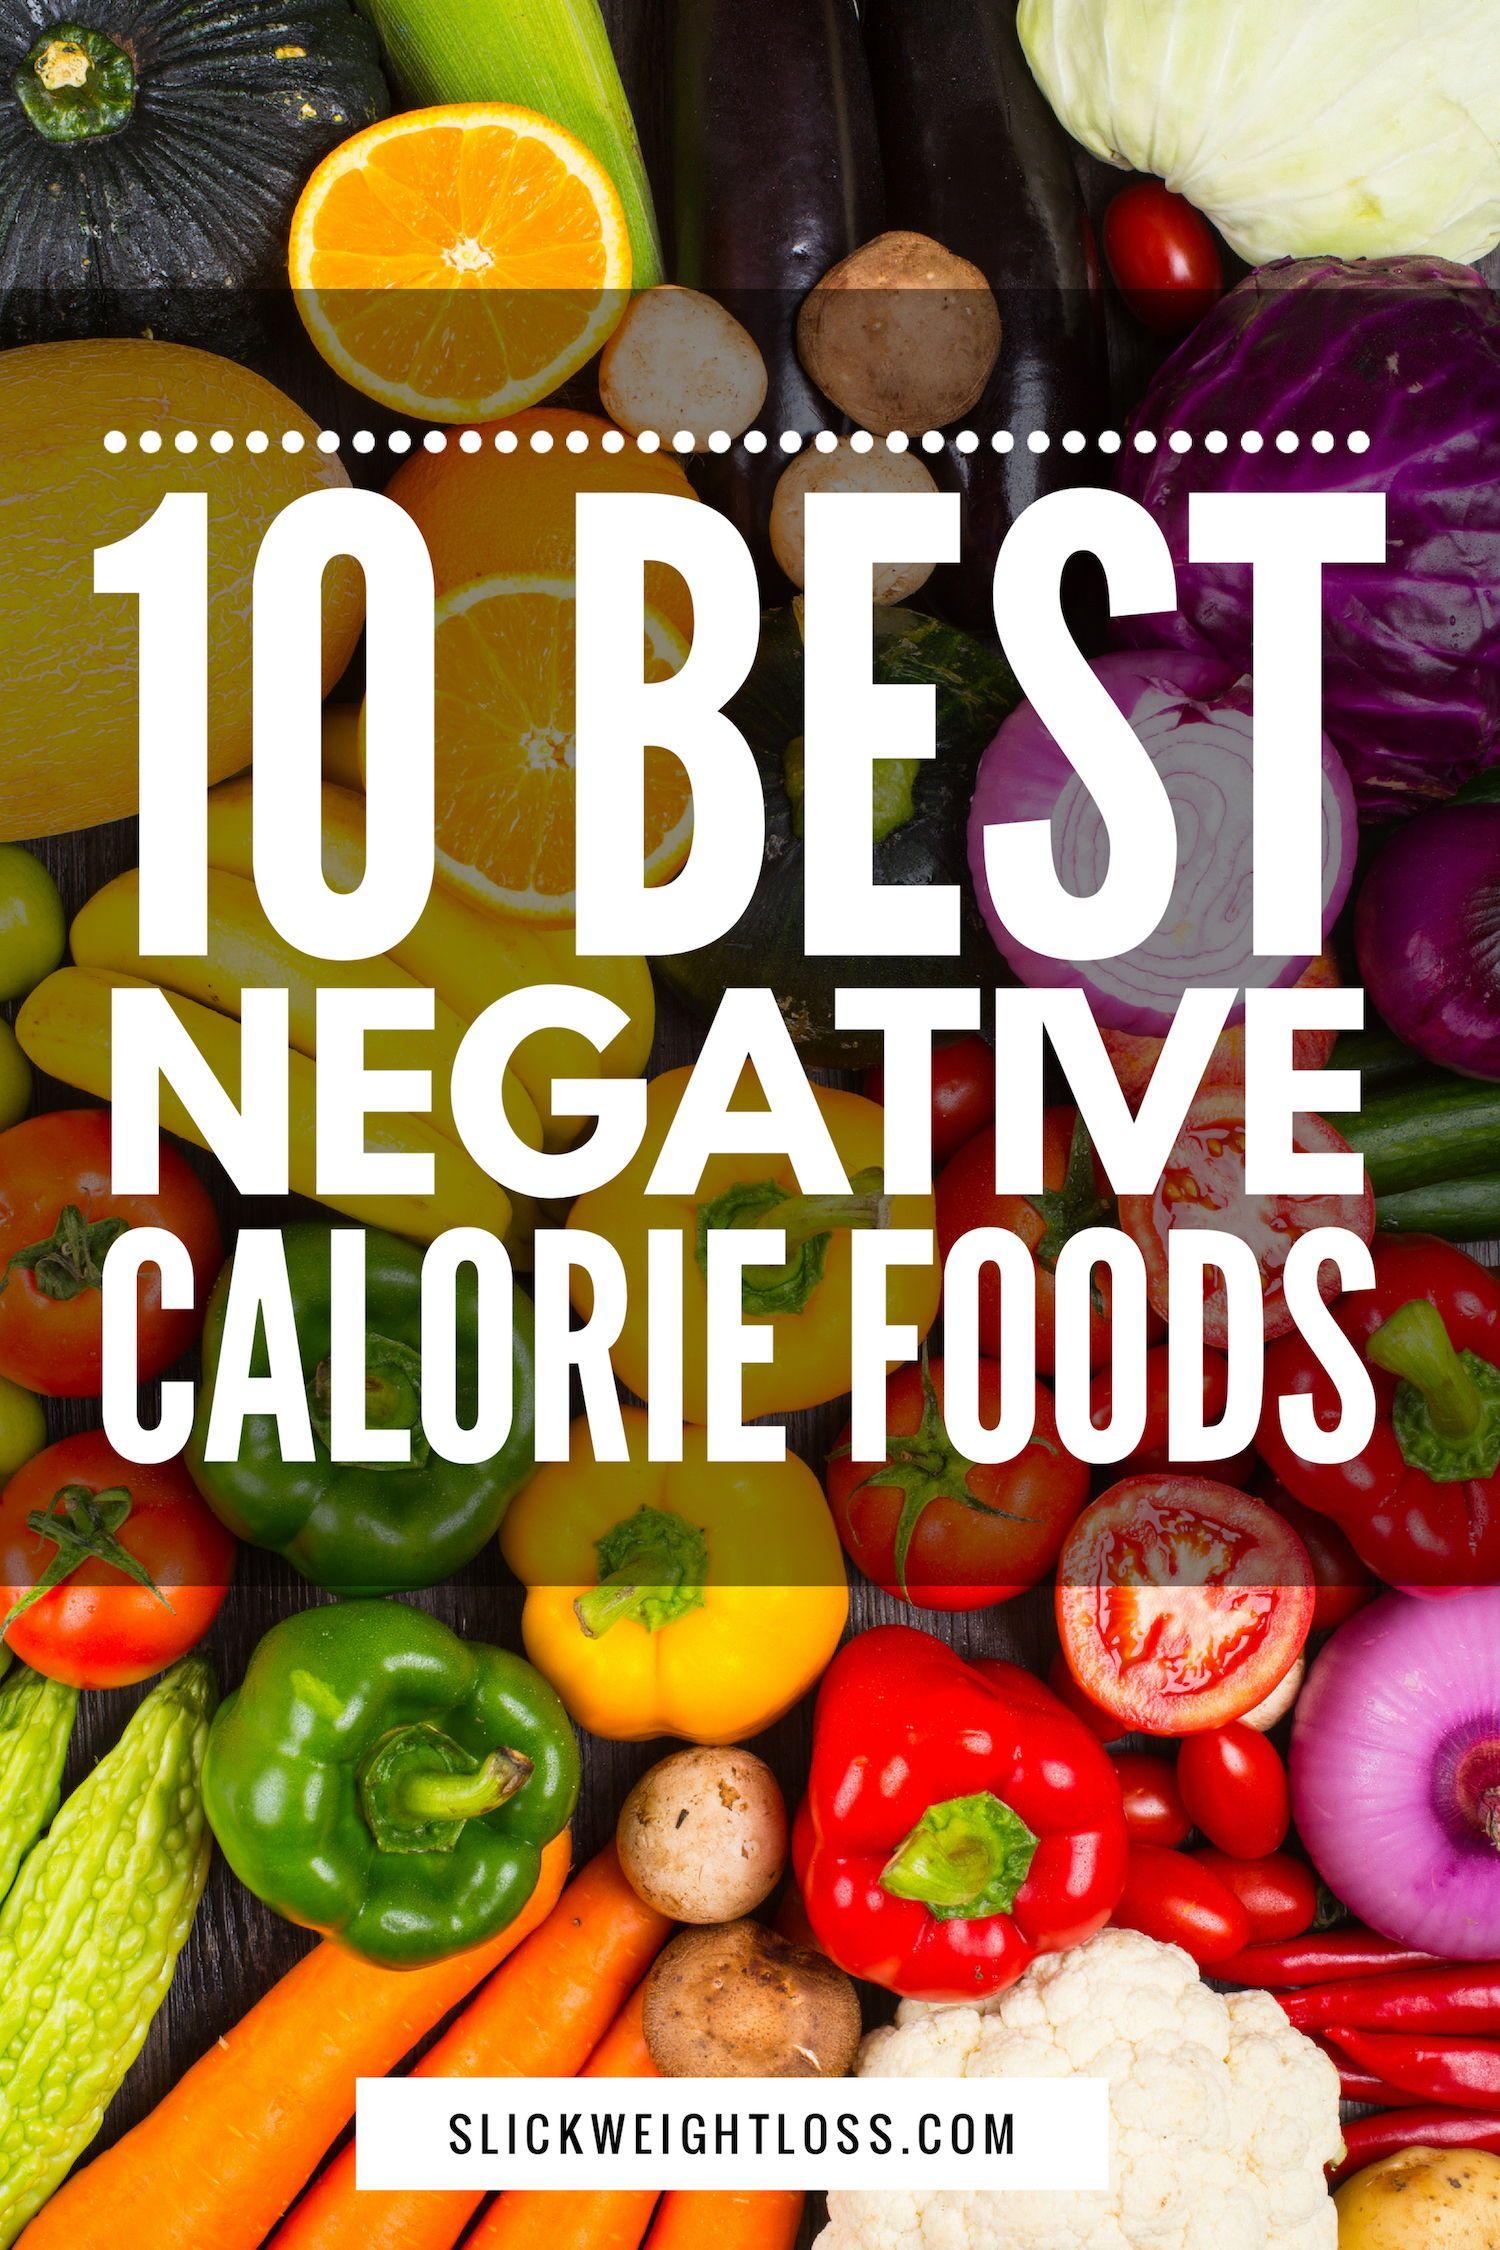 Negative Calorie Foods (With images) Negative calorie